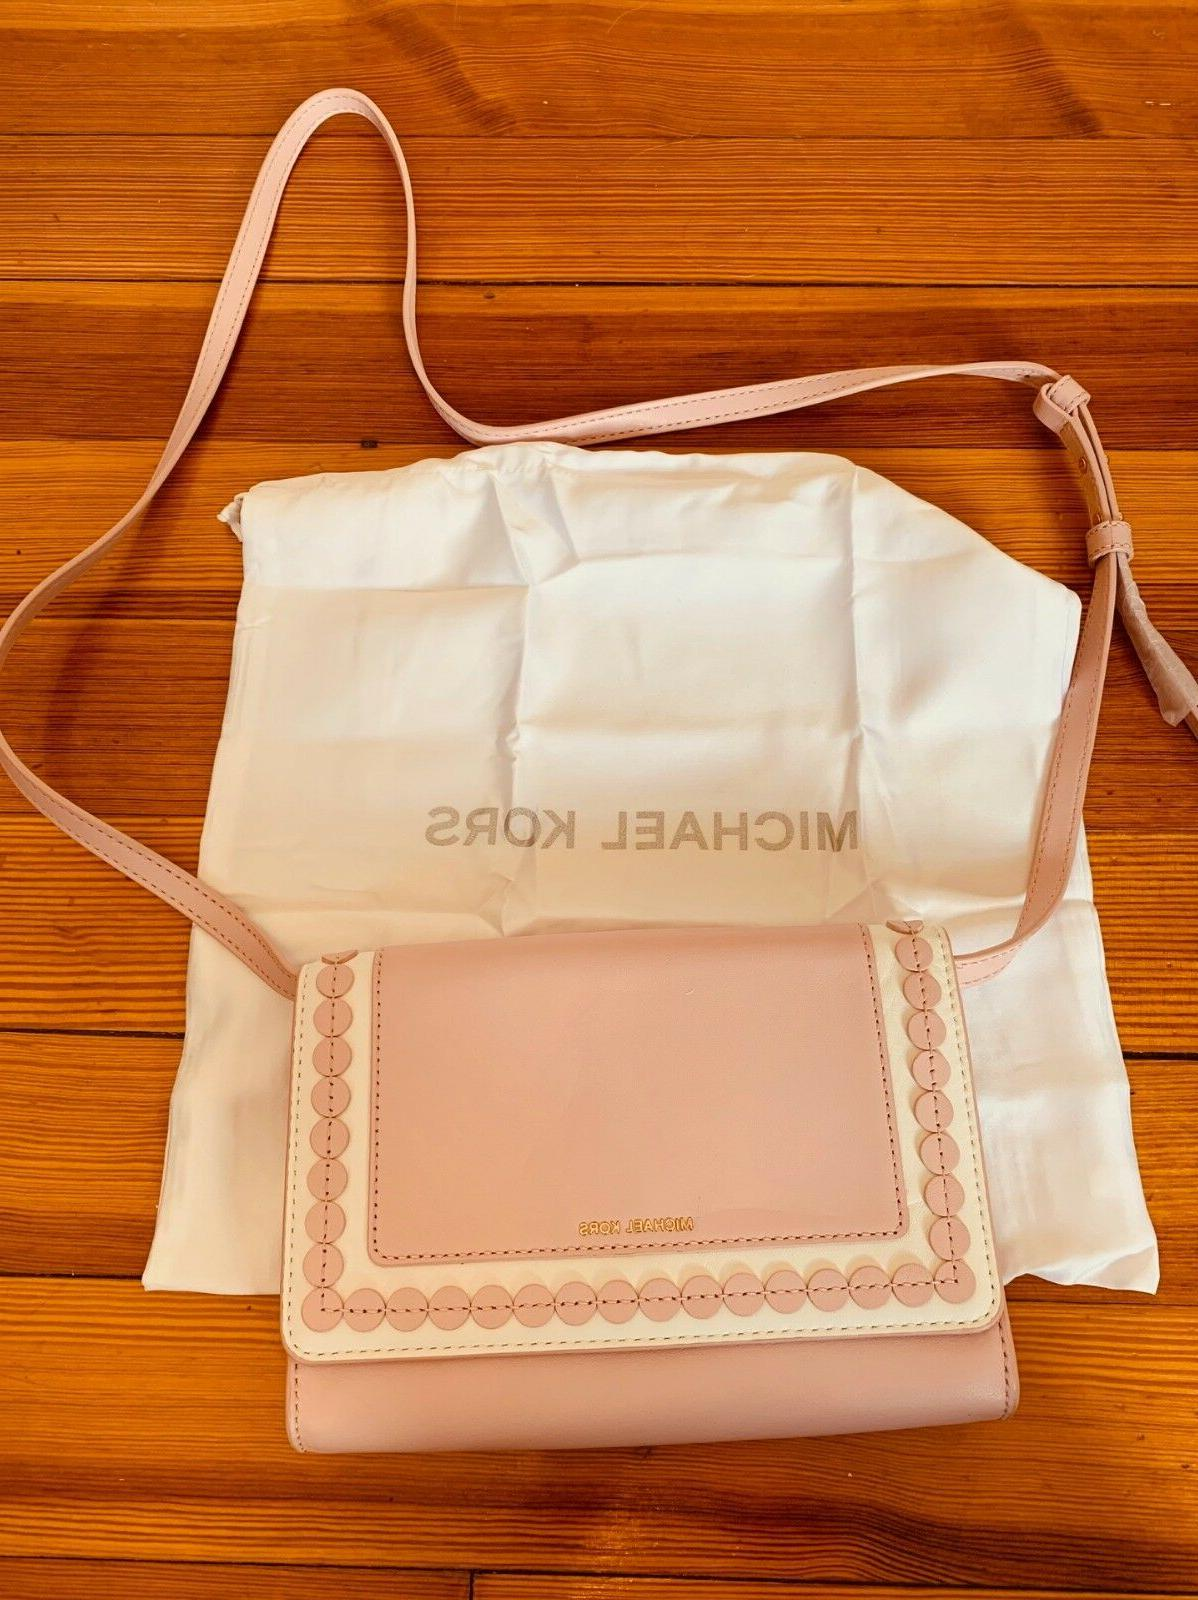 Designer Michael Kors pink white leather crossbody small